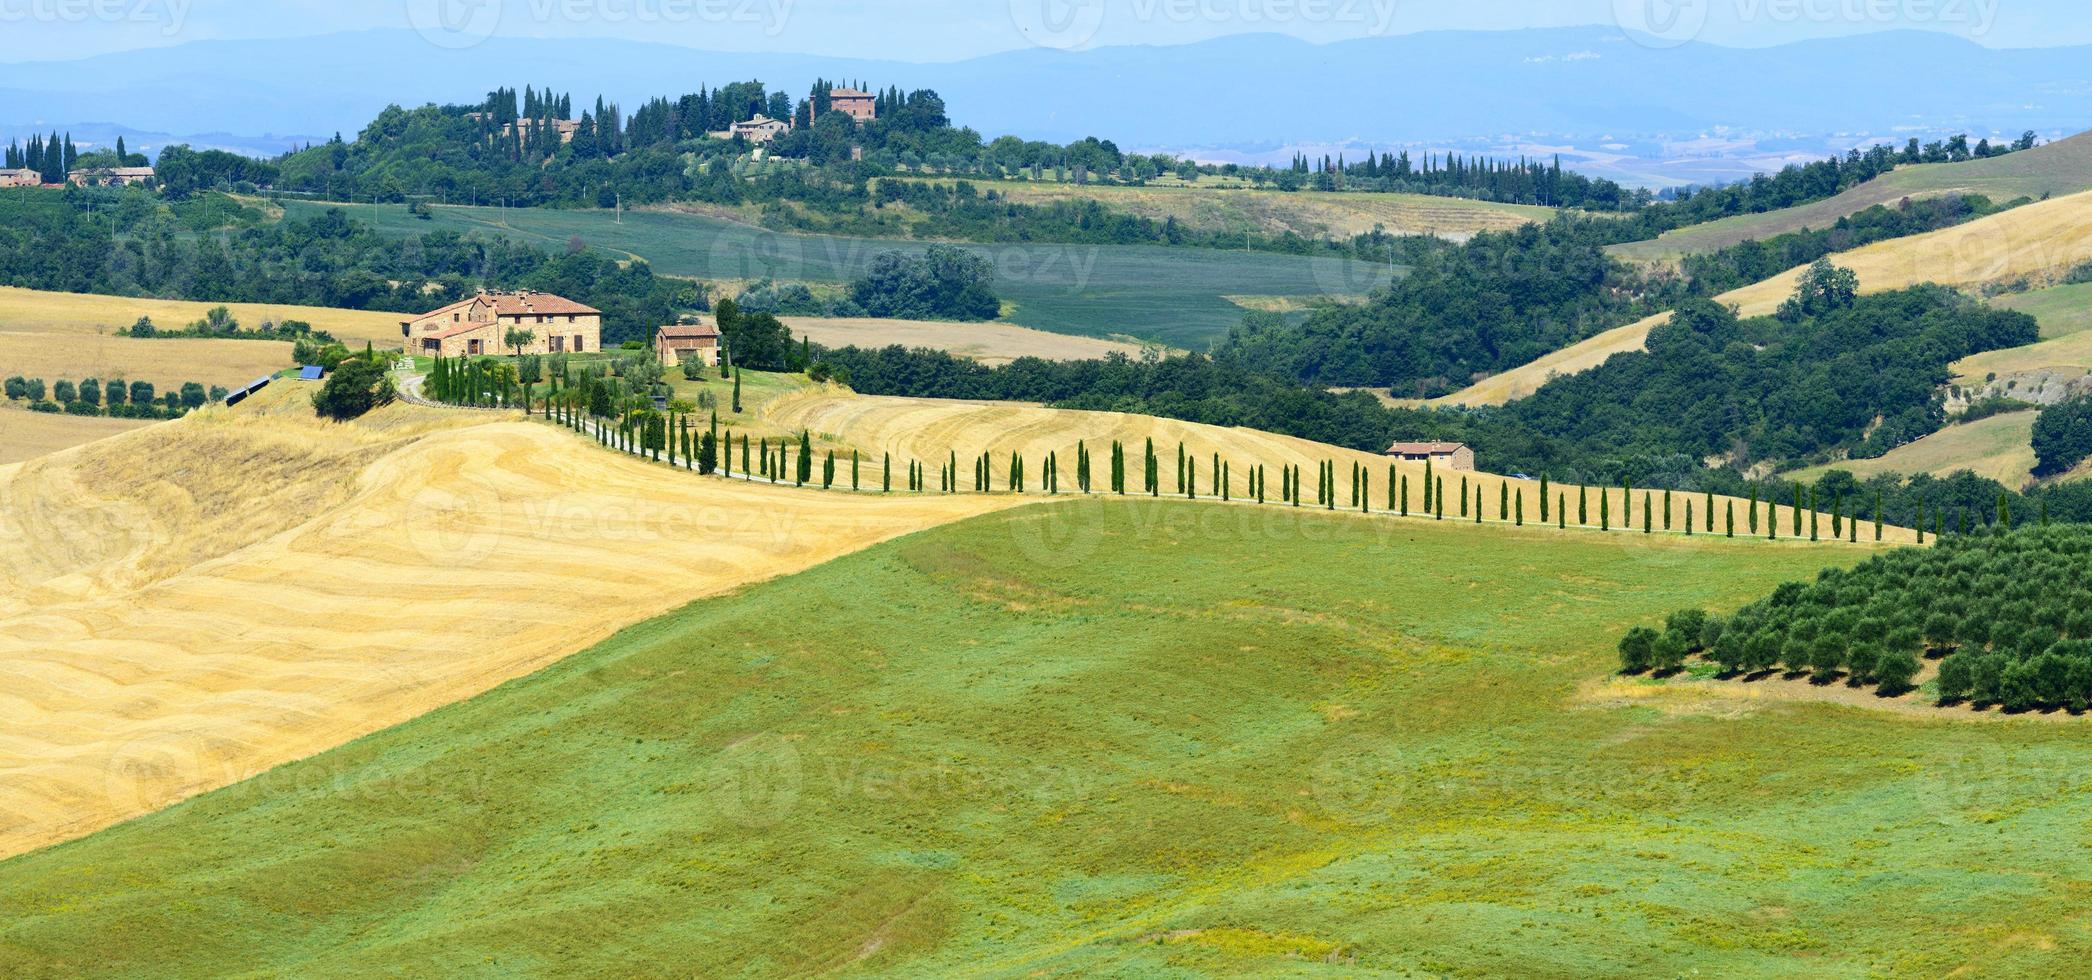 Crete Senesi (Tuscany, Italy) photo